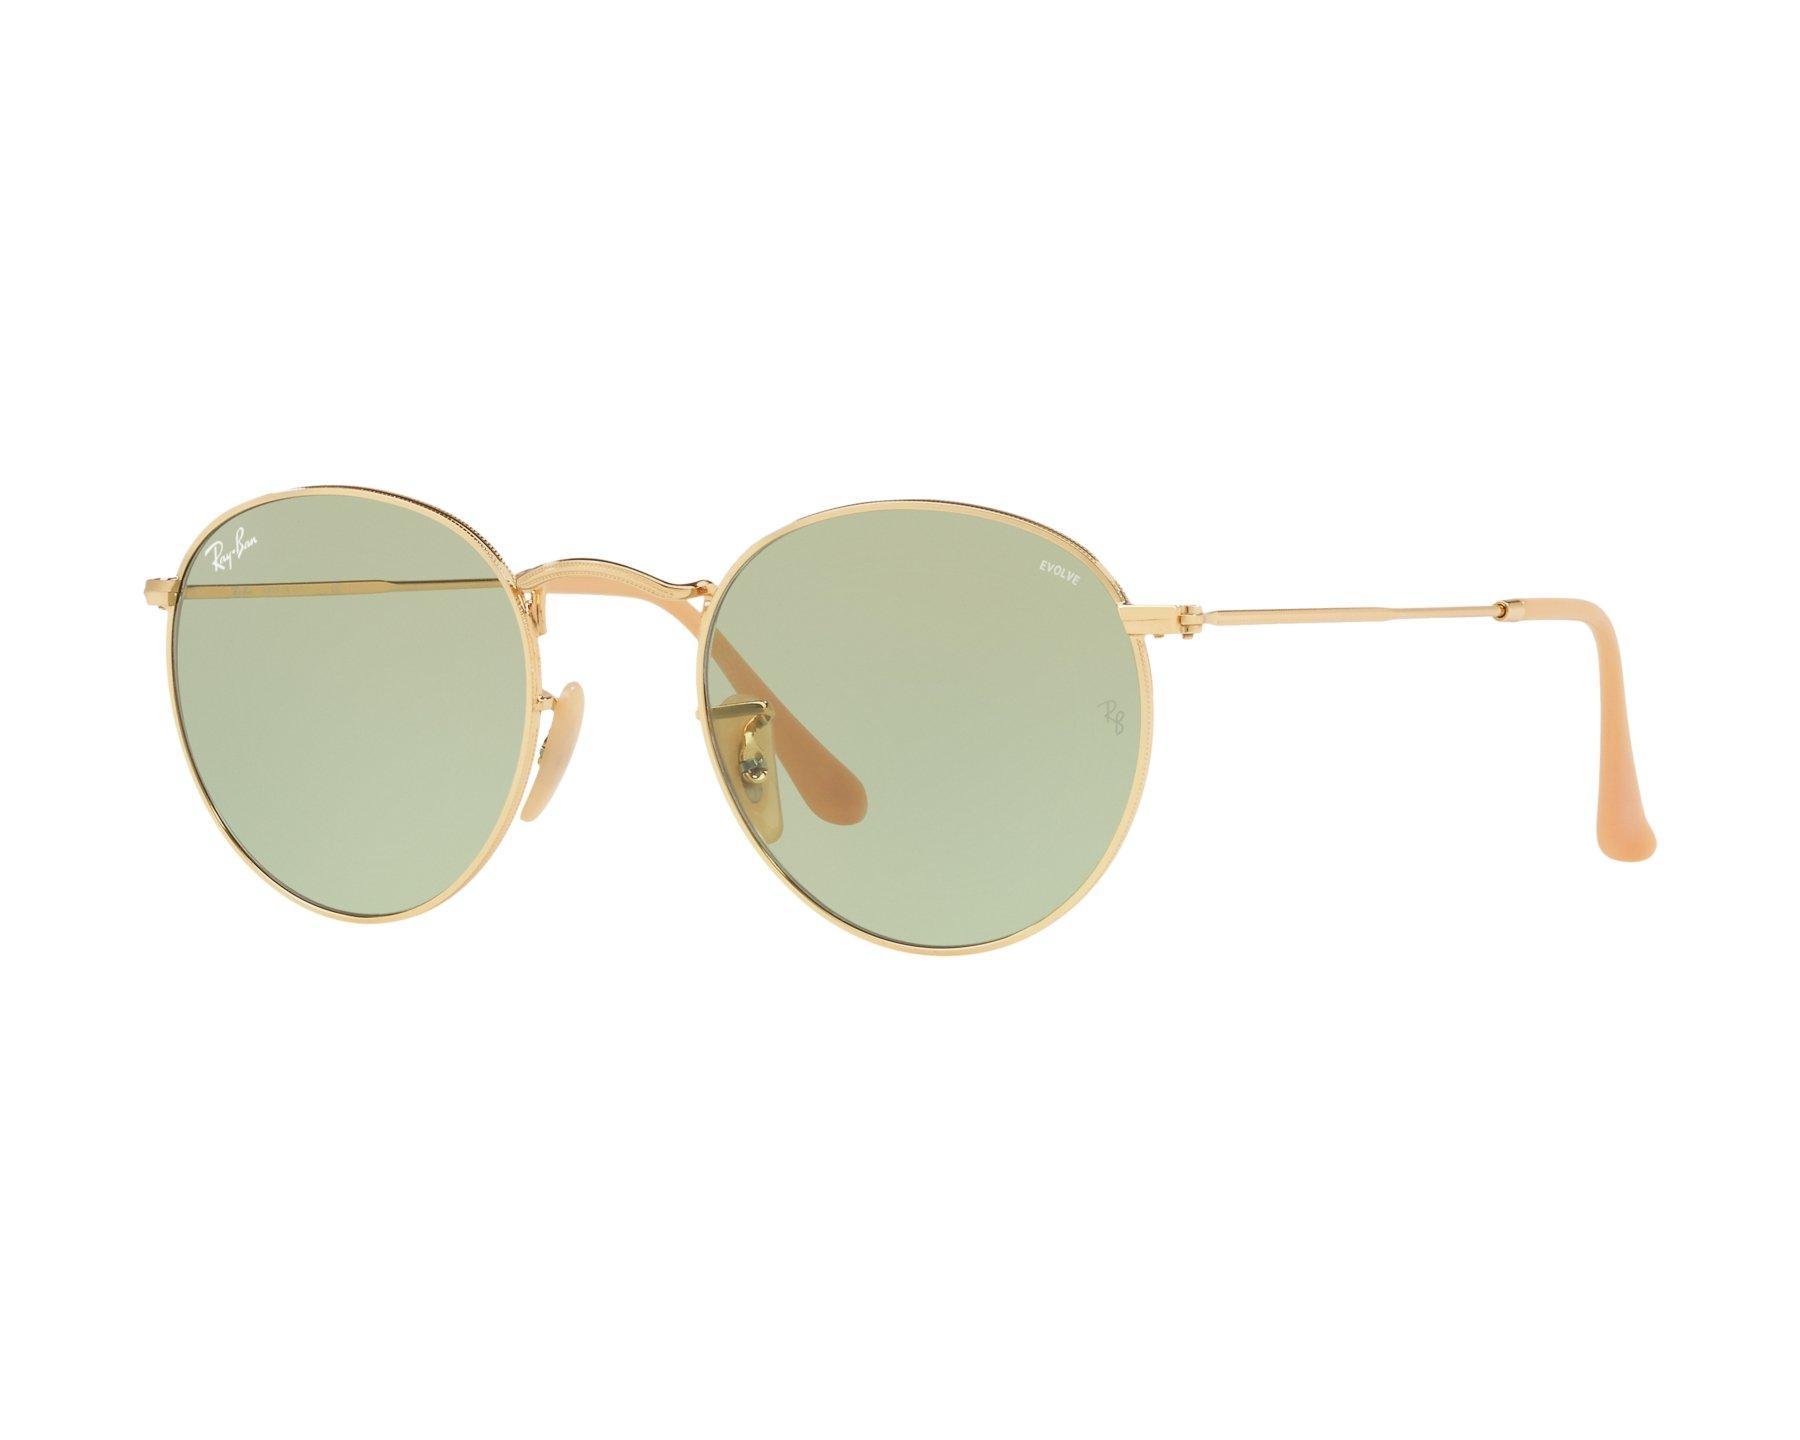 2f704bbac6c norway ray ban round metal 3447 sunglasses thumbnail 2 09e0a 3ed9c   shopping sunglasses ray ban rb 3447 90644c 50 21 gold abf77 81ea4